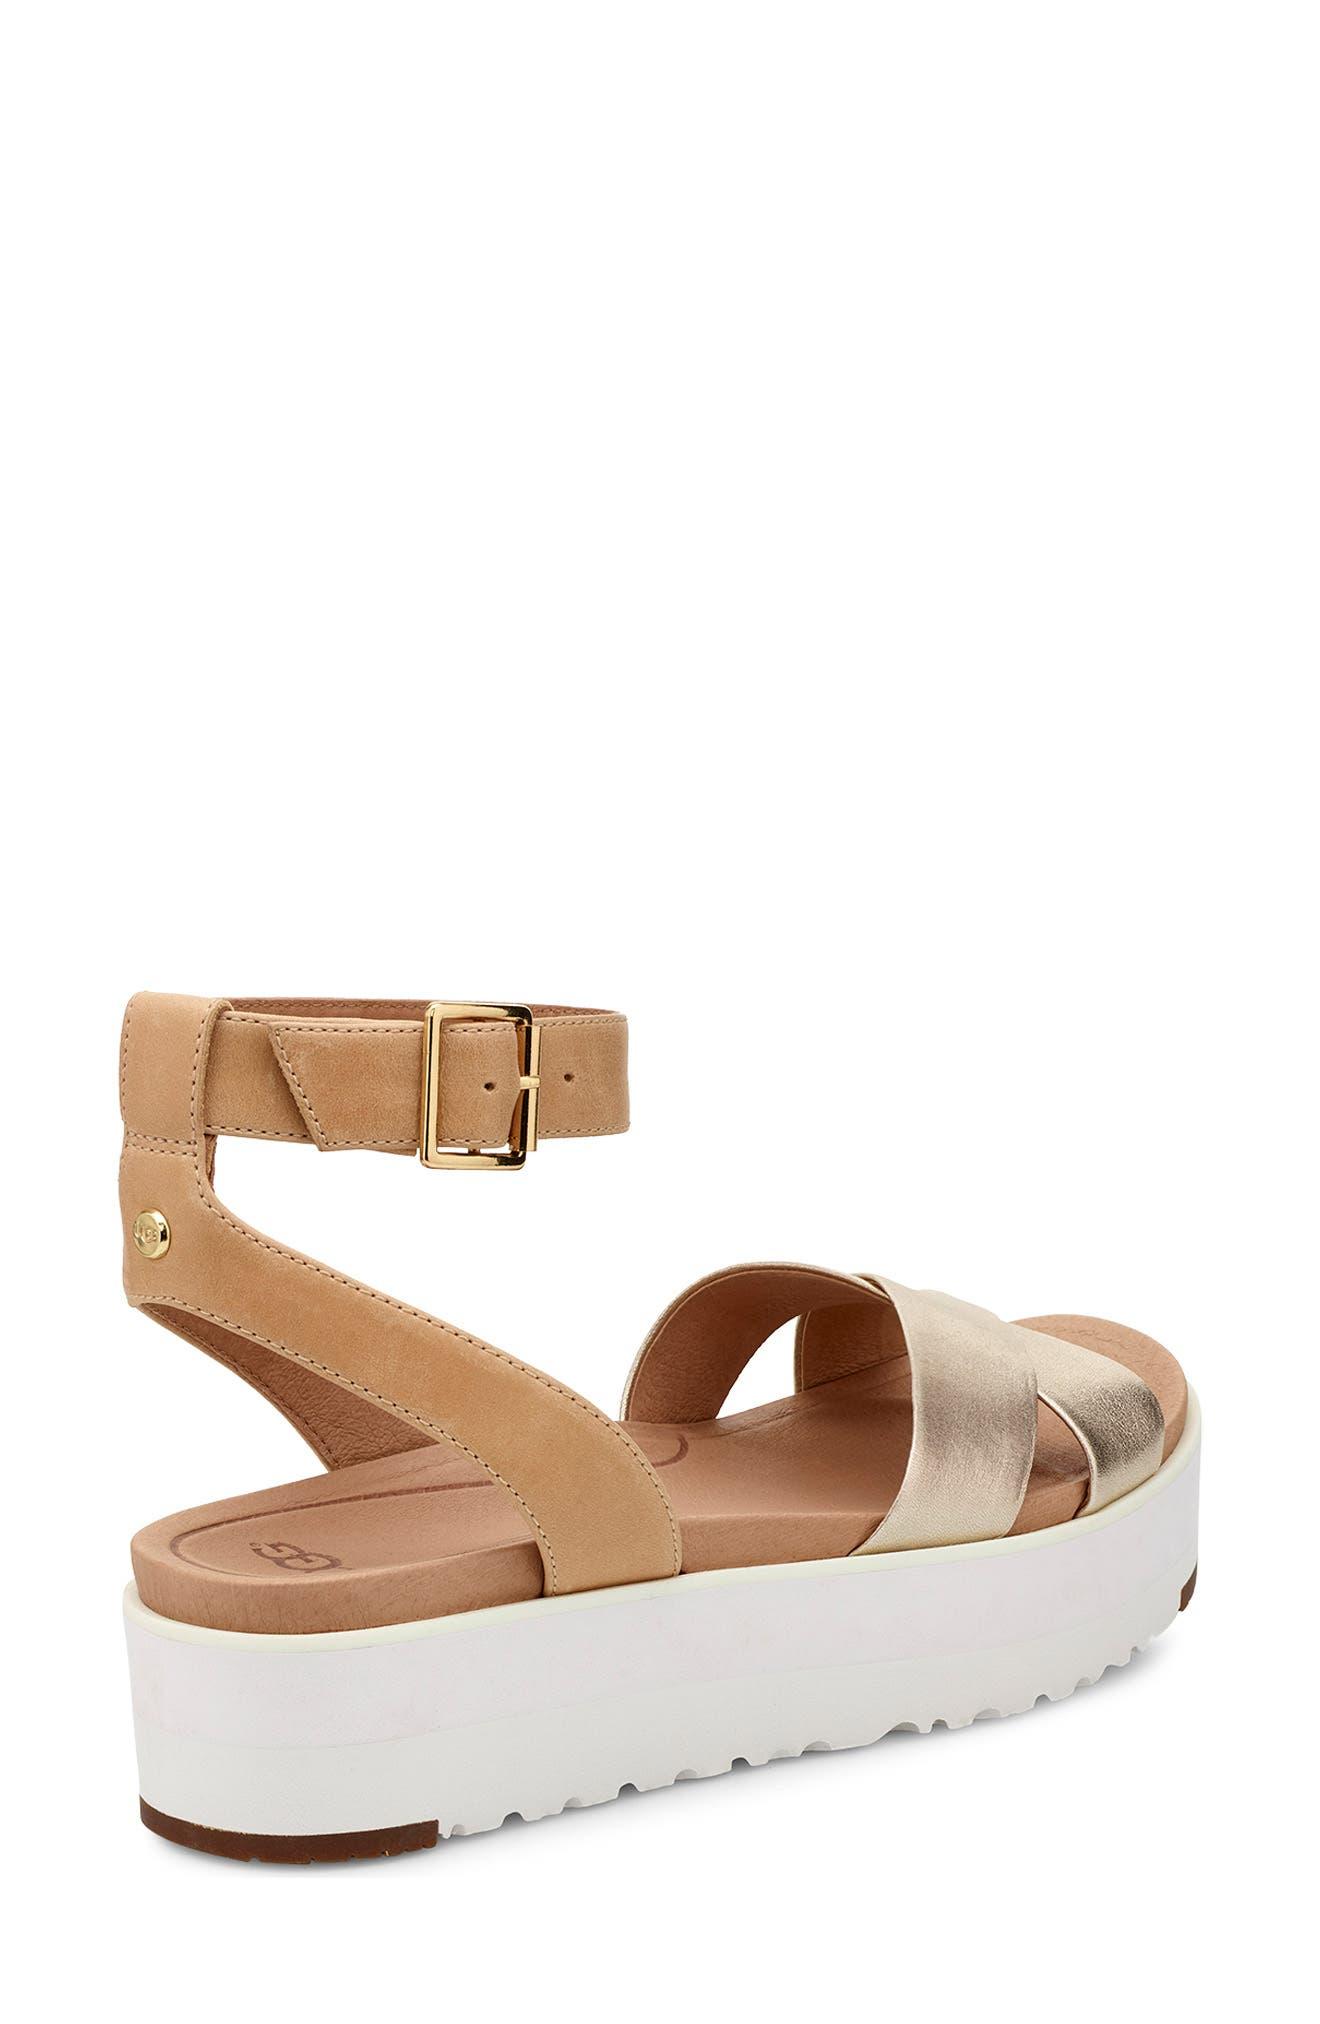 Tipton Metallic Platform Sandal,                             Alternate thumbnail 2, color,                             GOLD